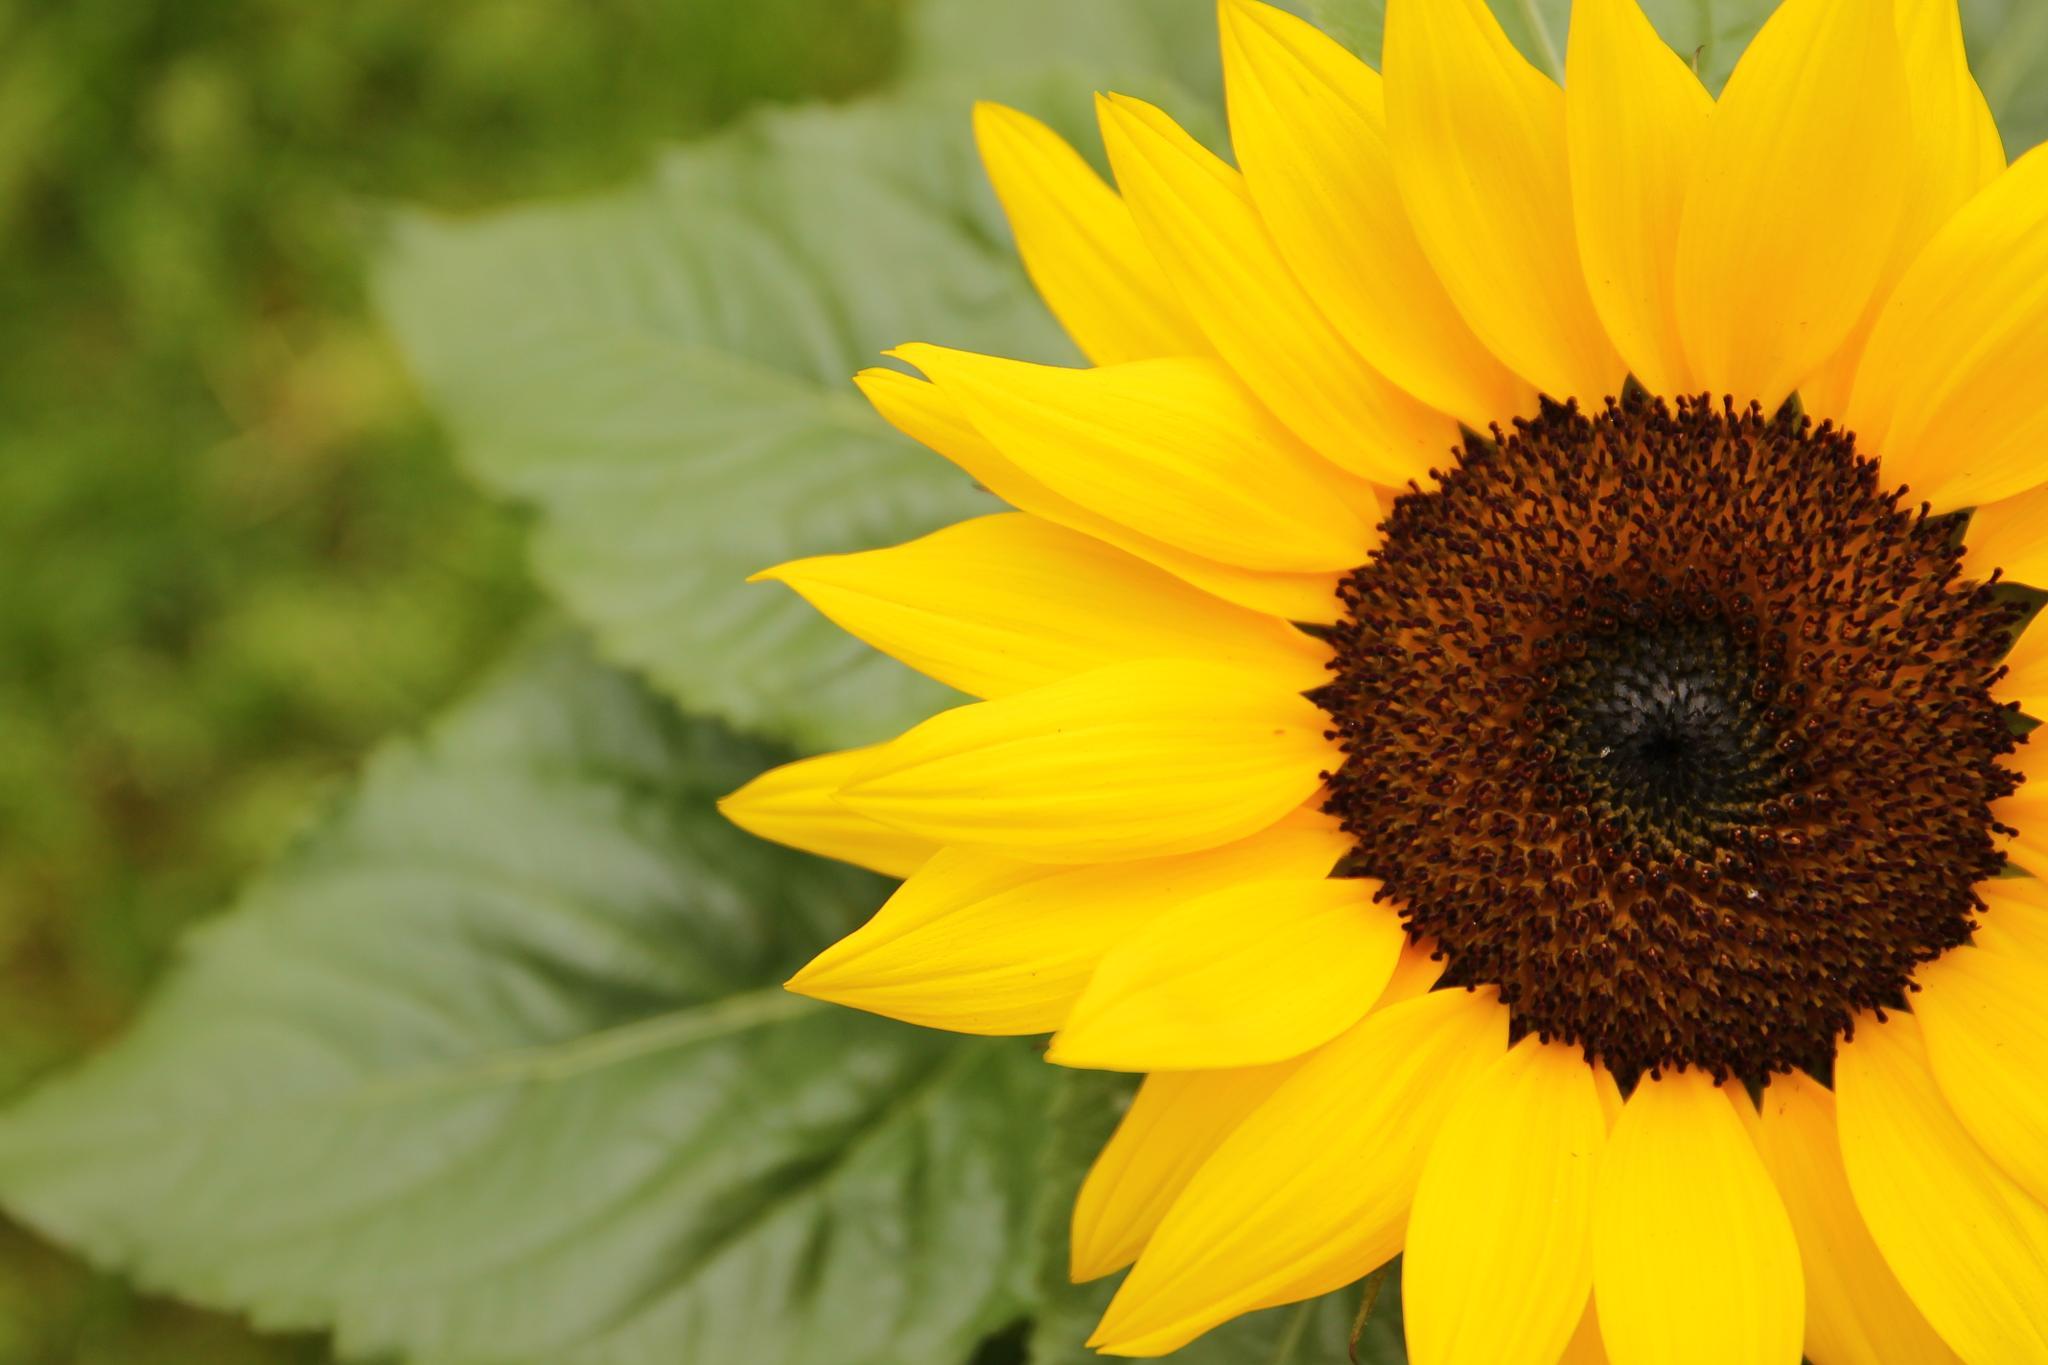 Sunflowers by kikkakobe